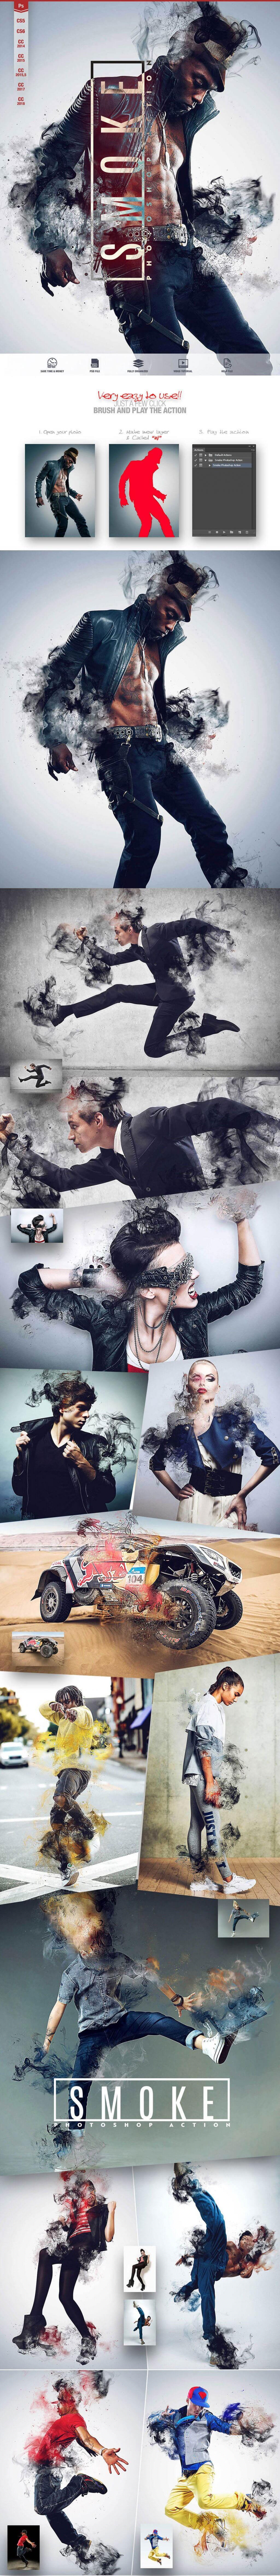 Smoke Photoshop Action CS5 Design